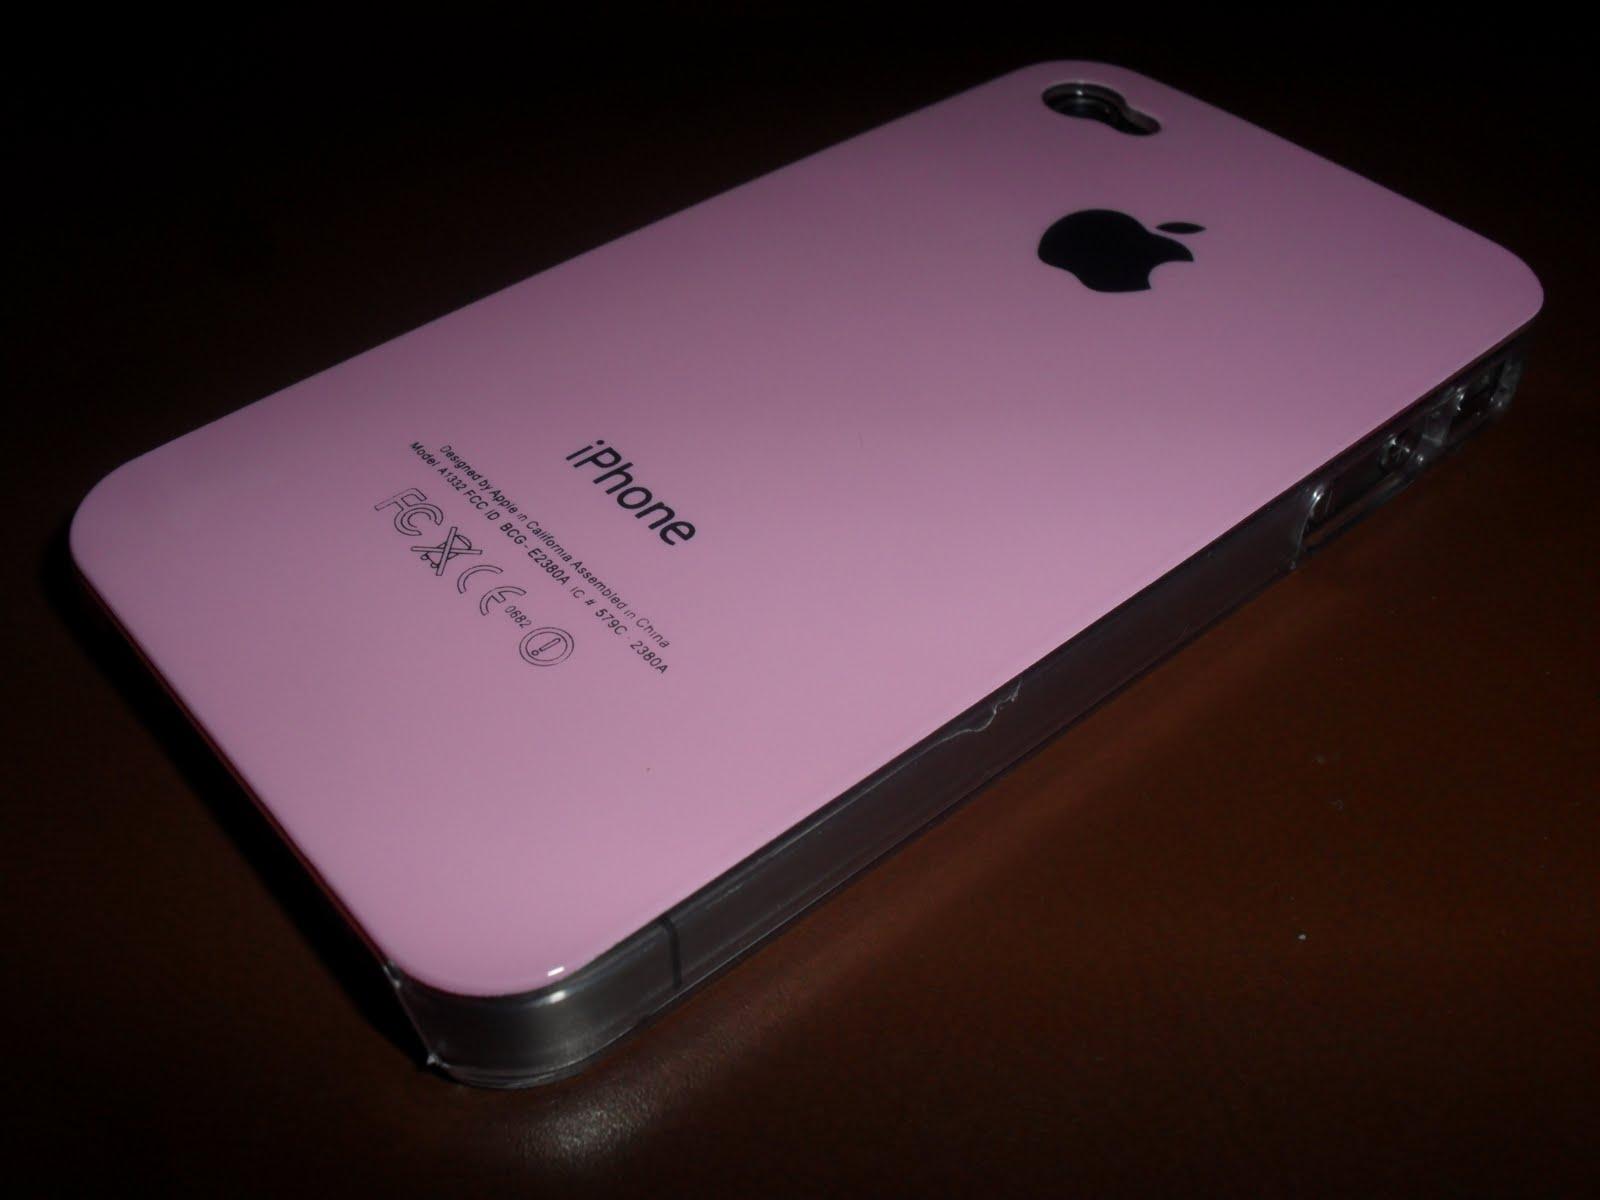 Case Design phone case images : Pretty Iphone 4 Case My pretty iphone case!